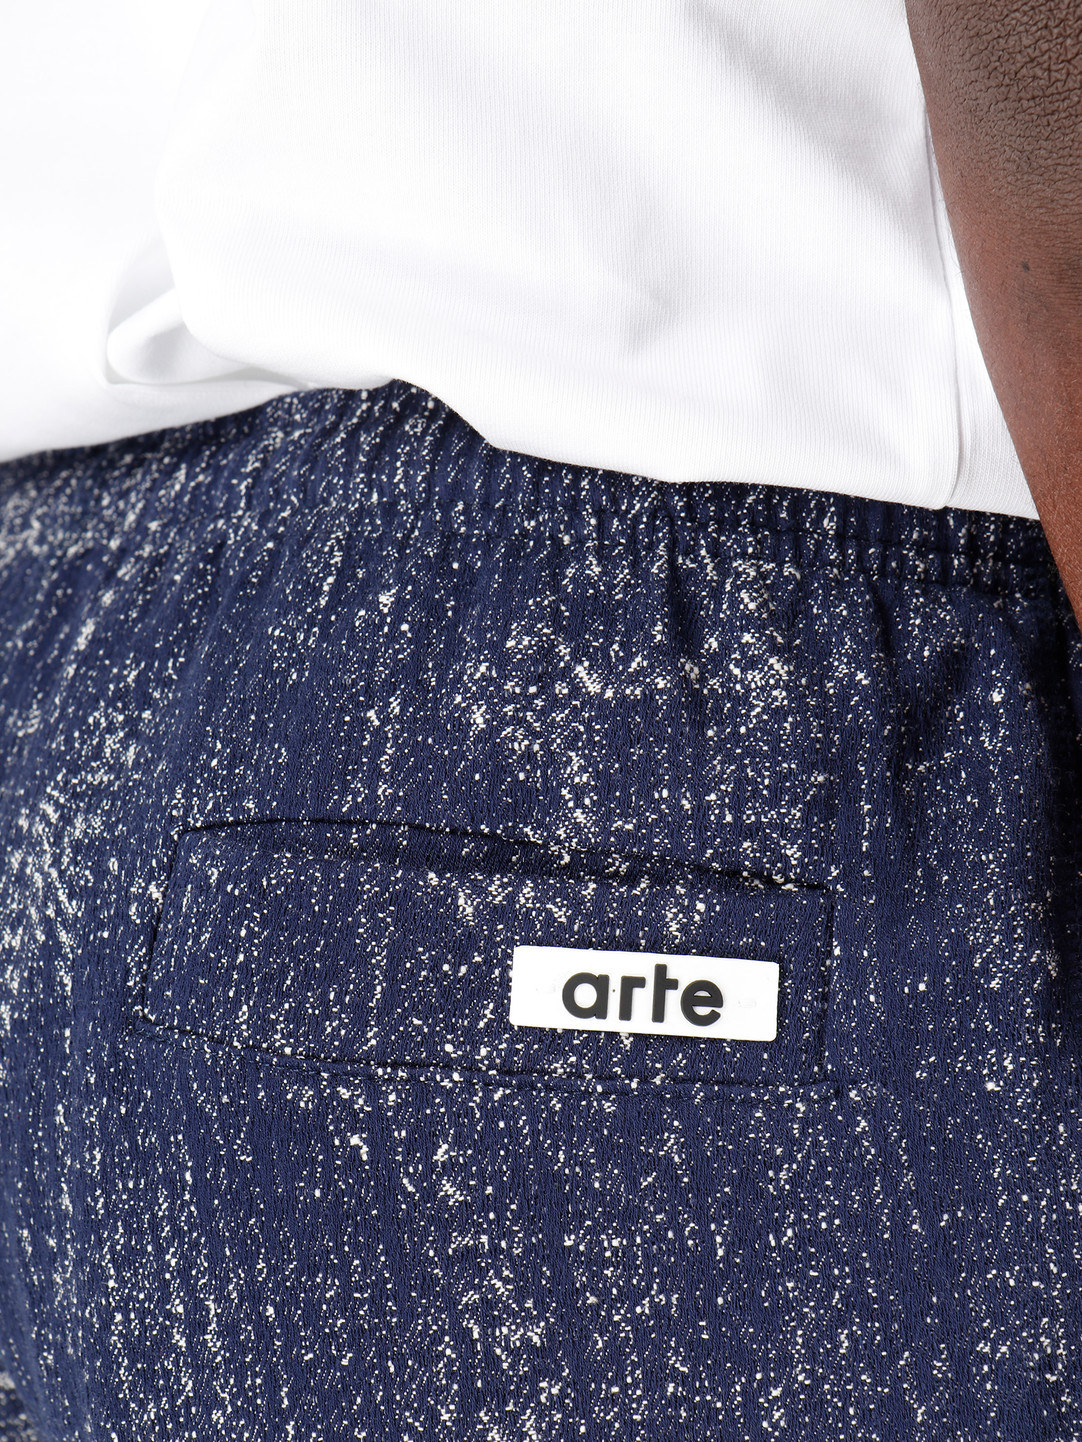 Arte Antwerp Arte Antwerp Suns Shorts Navy White SS20-052SHO